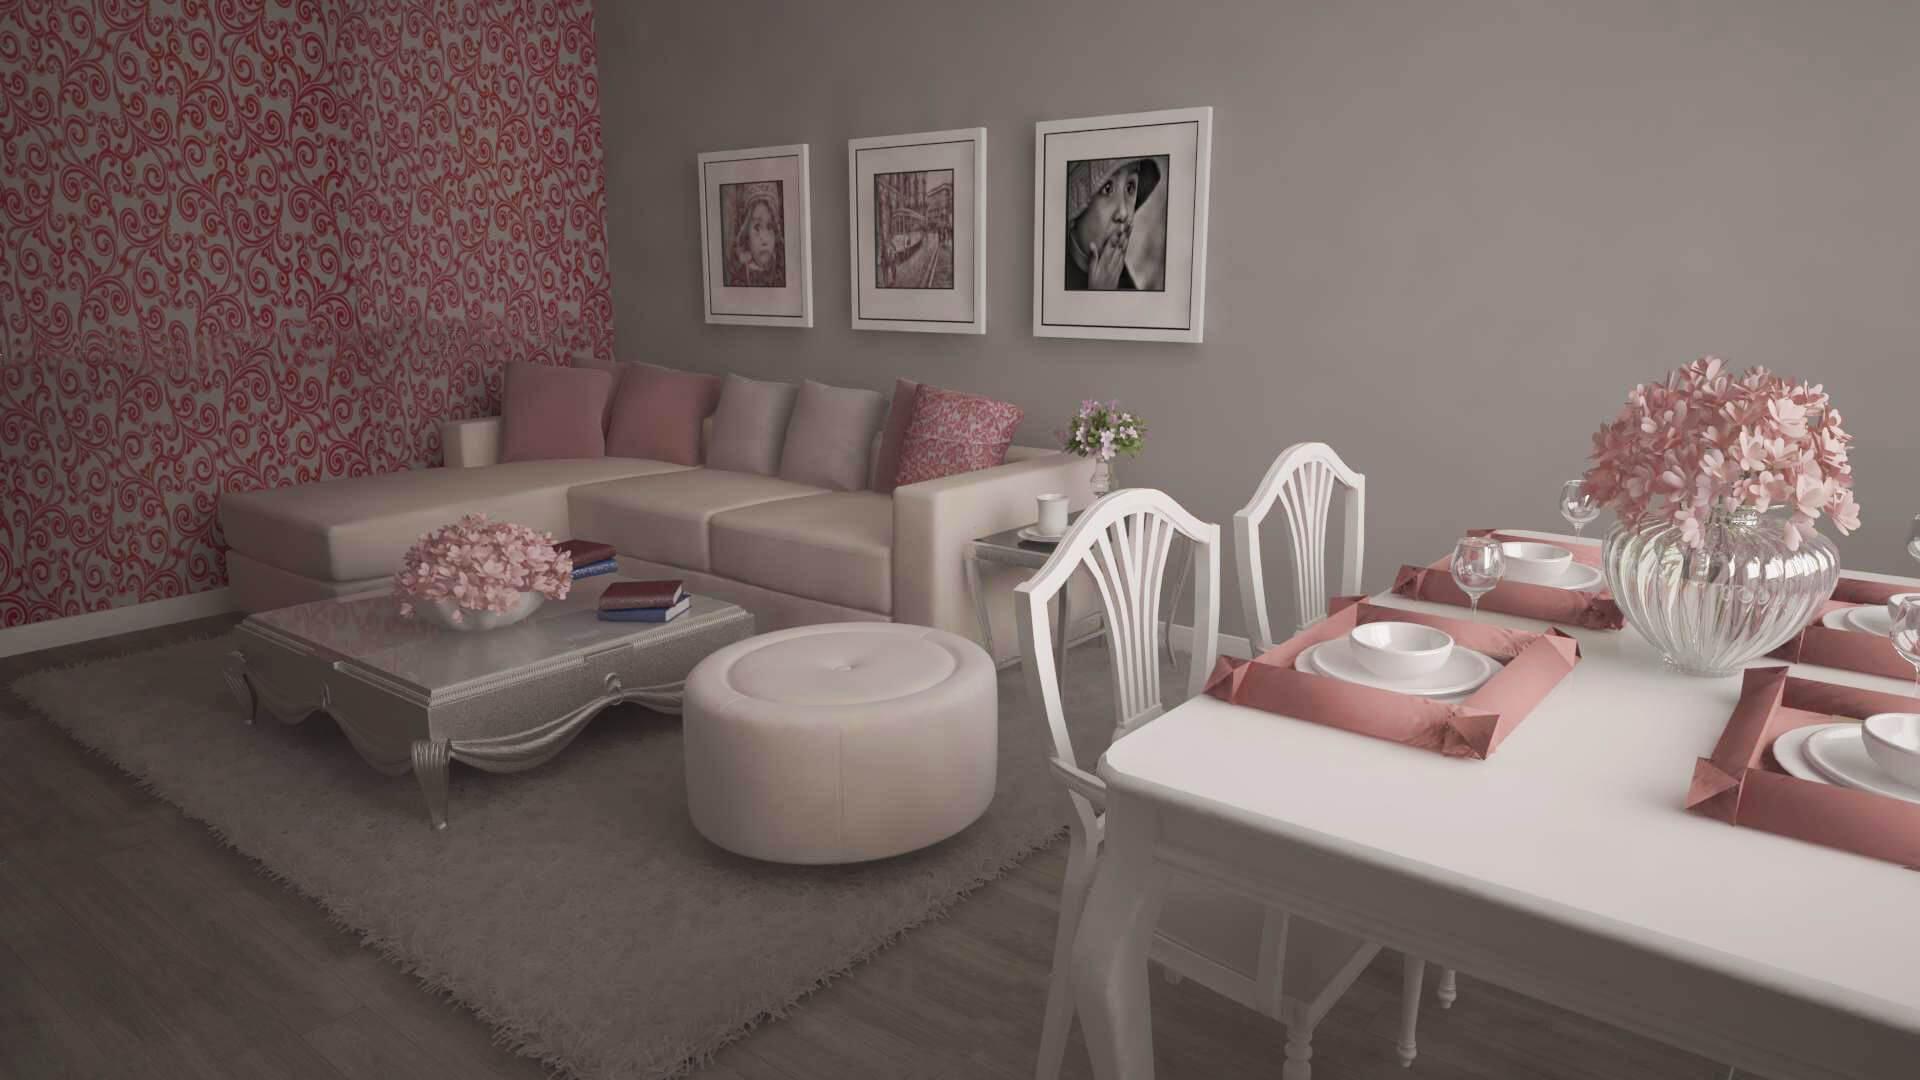 Decorador de interiores paloma angulo with decorador de - Decorador de interiores virtual ...